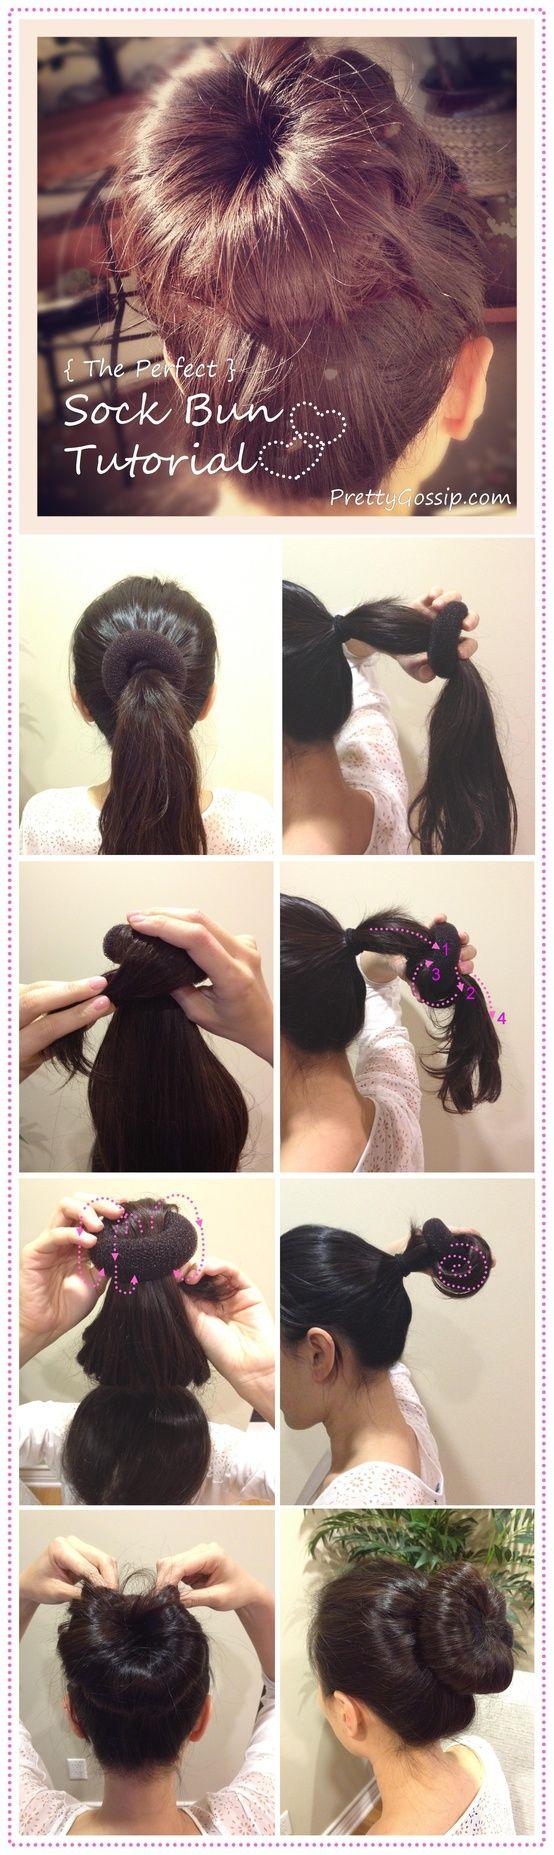 Finally, a sock bun tutorial that makes sense! Thank you Pretty Gossip! @ The Beauty ThesisThe Beauty Thesis